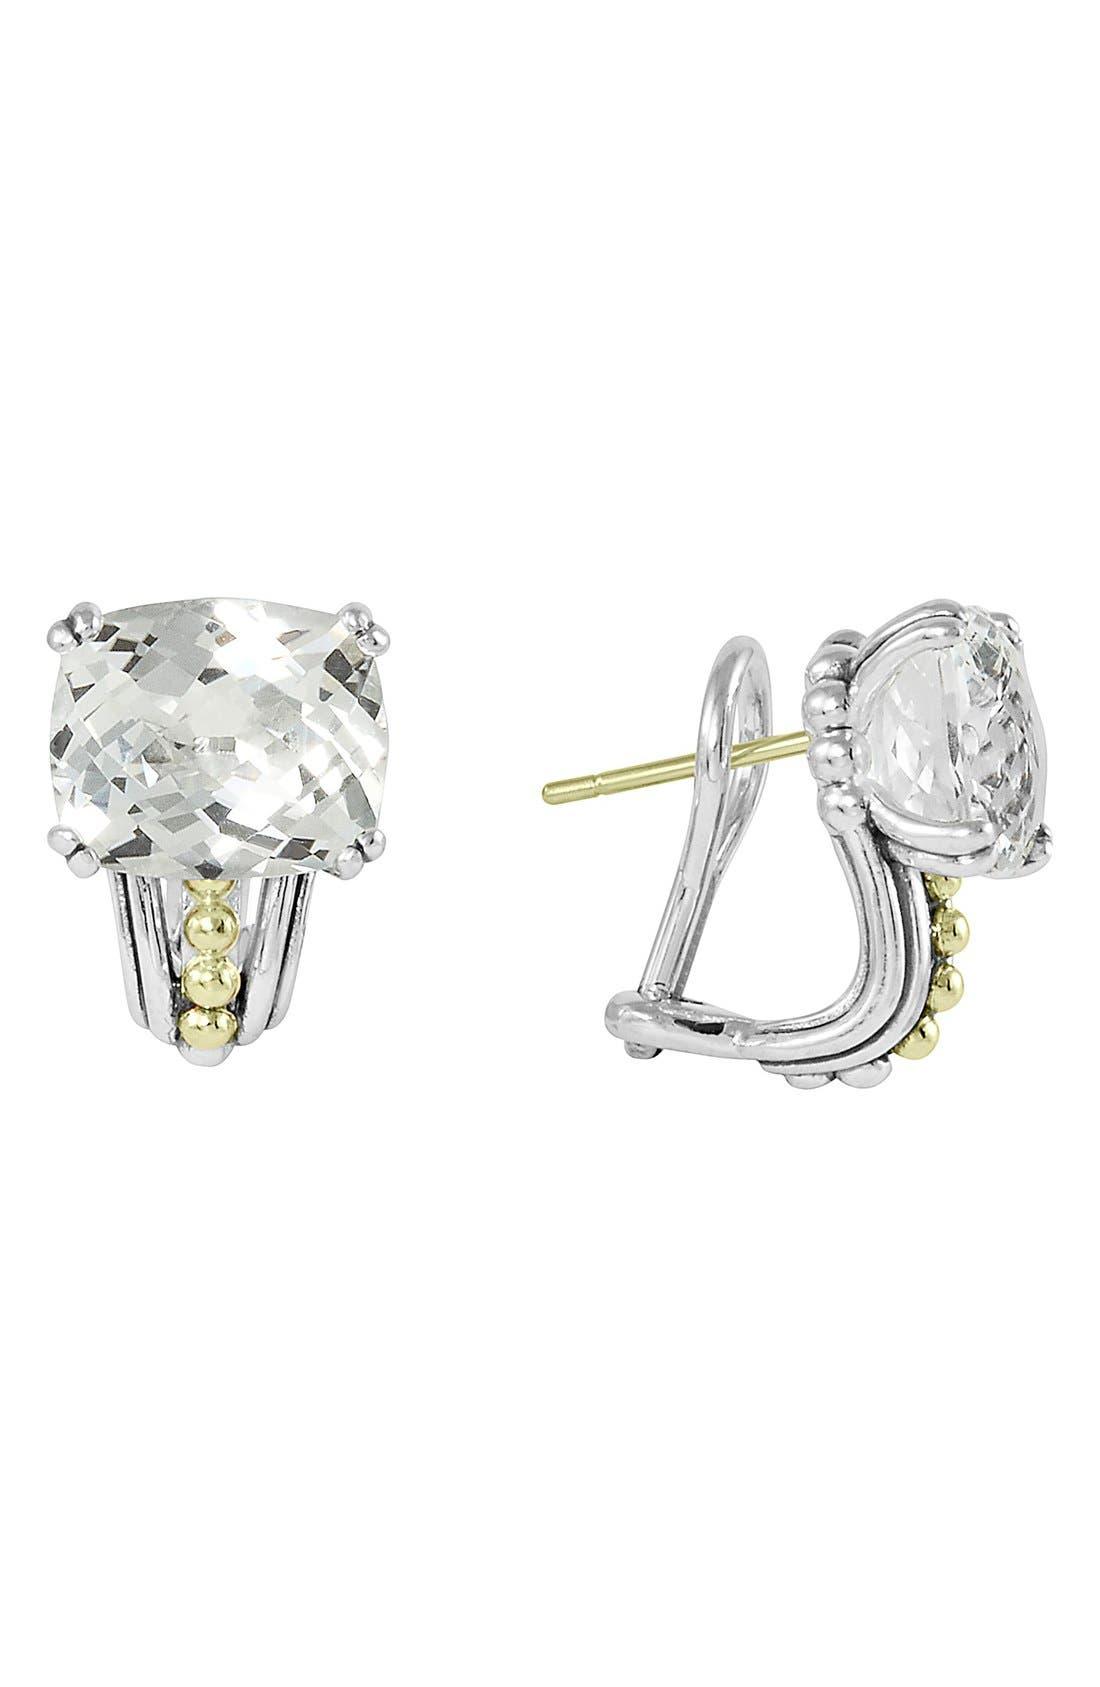 Main Image - LAGOS 'Prism' Stud Earrings